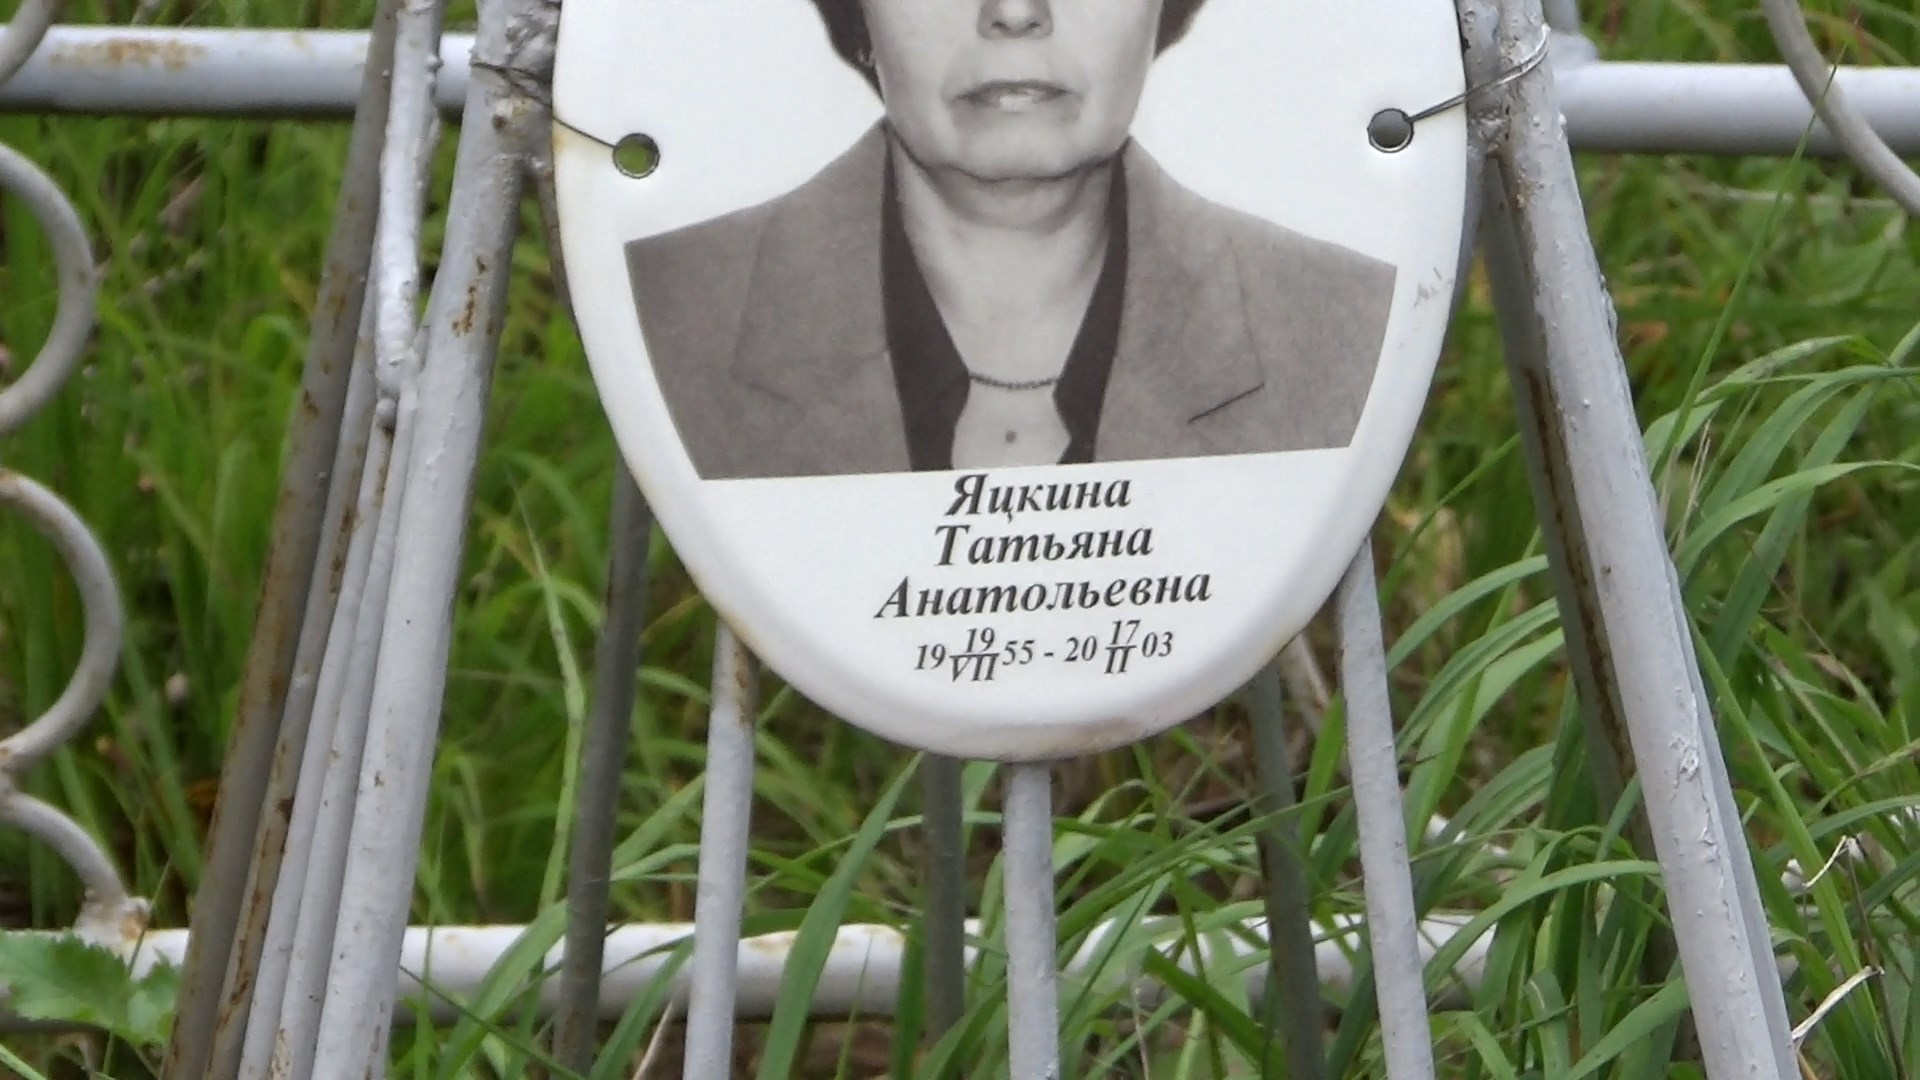 Тараканова татьяна анатольевна, Татьяна Анатольевна Тараканова(Сыченикова) 11 фотография